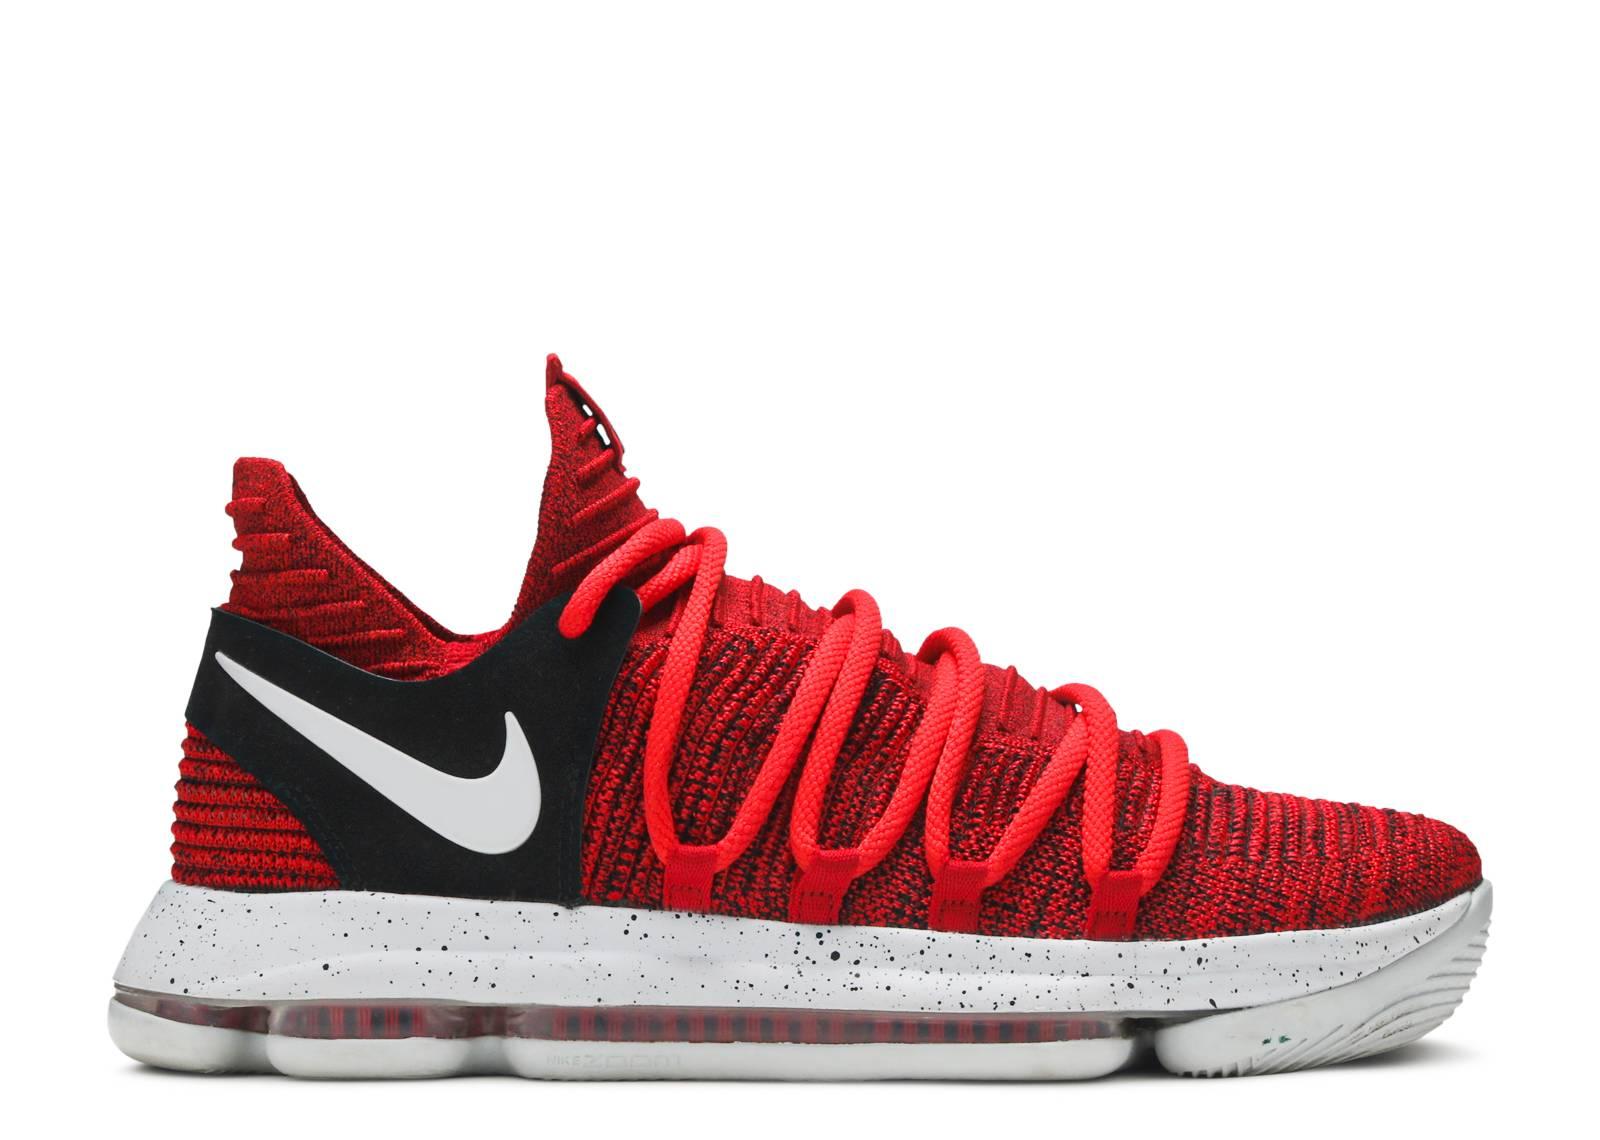 buy online 1e1e2 3b5d5 Nike Zoom Kd10